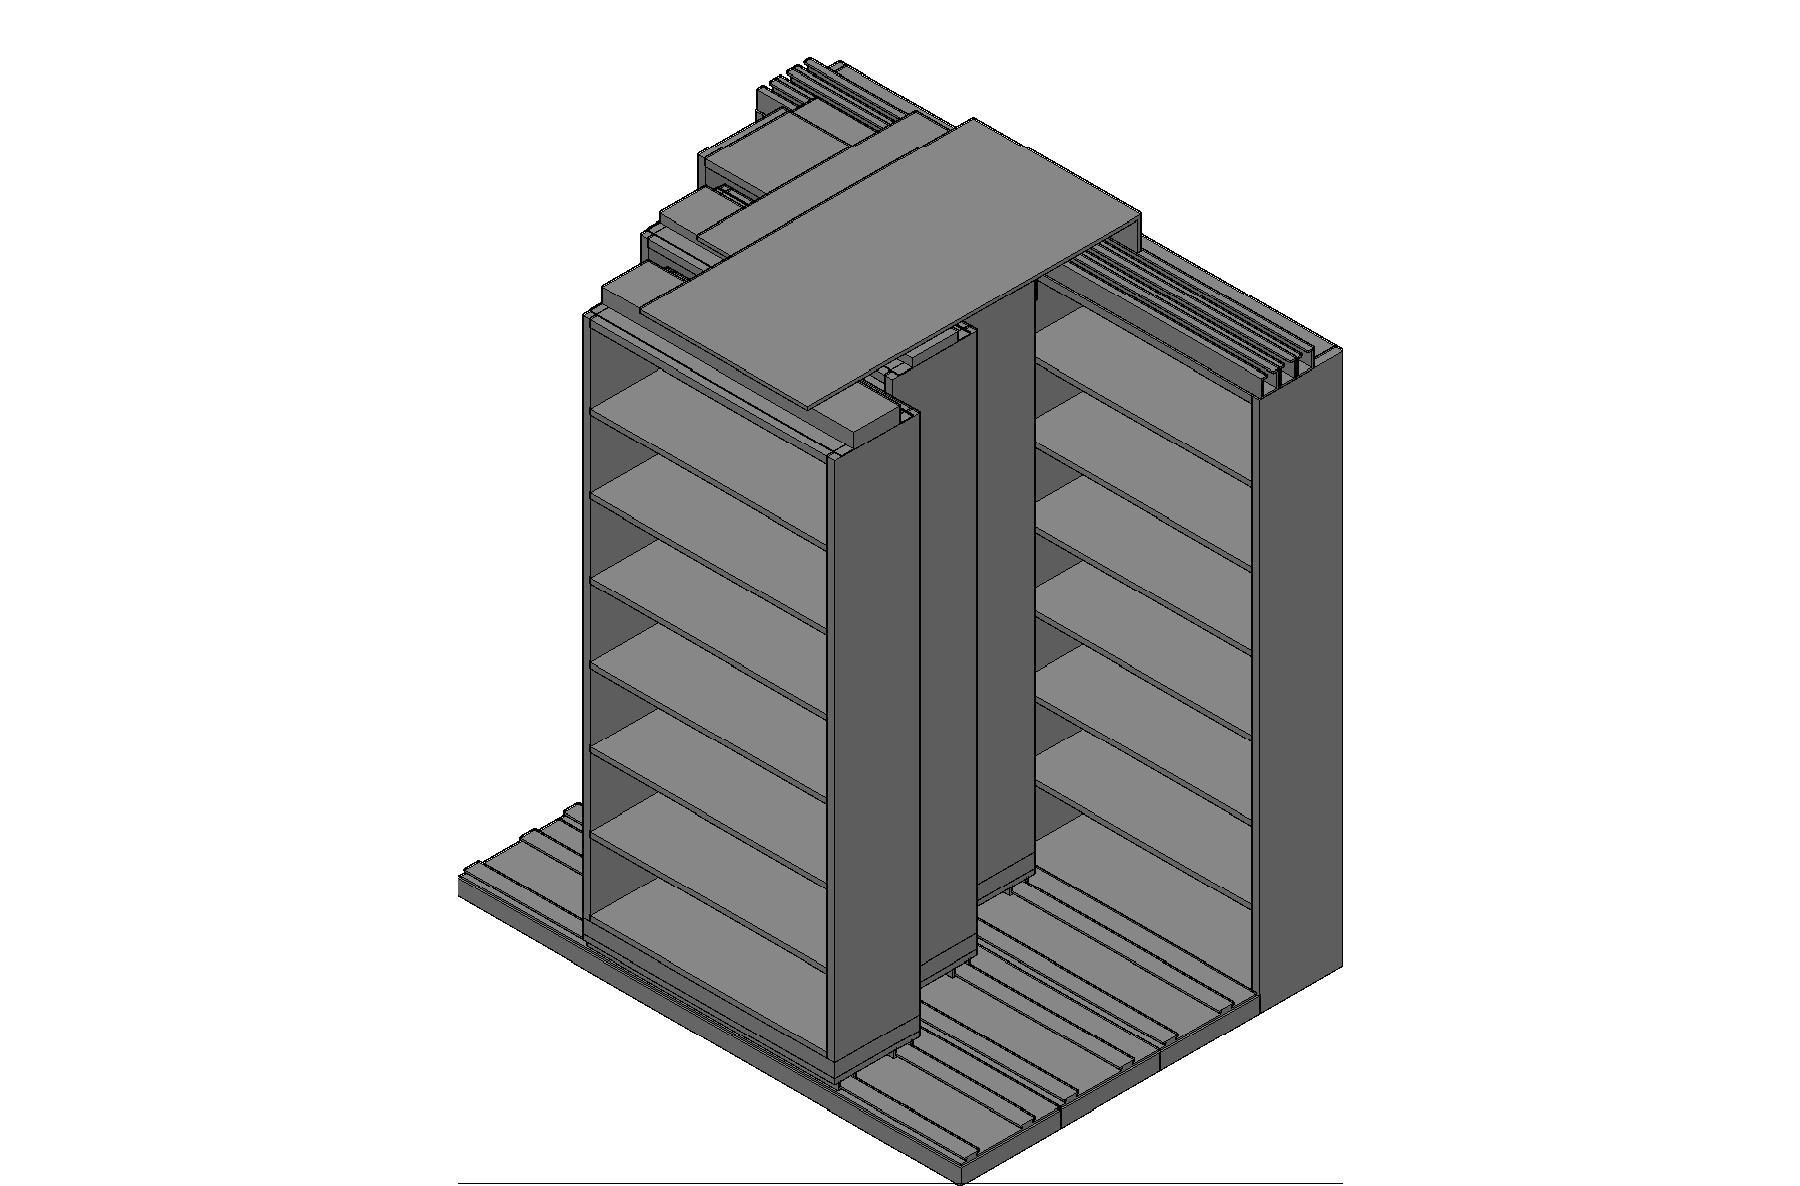 "Letter Size Sliding Shelves - 4 Rows Deep - 7 Levels - (36"" x 12"" Shelves) - 76"" Total Width"